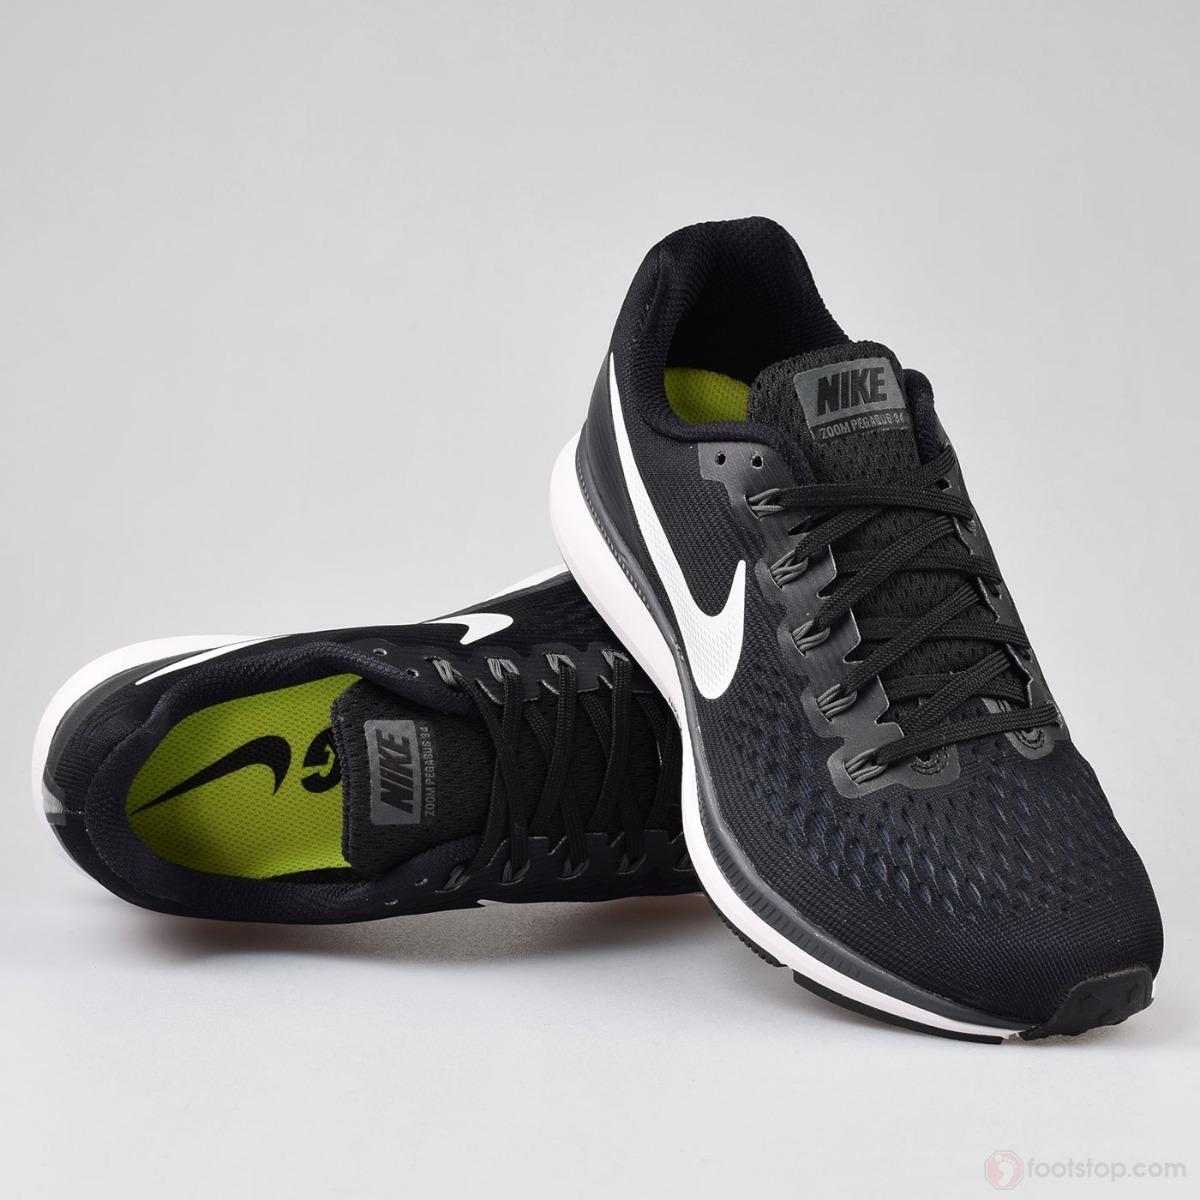 43e16bed12e Zapatillas Nike Air Zoom Pegasus 34 Originales Para Hombre - S  360 ...